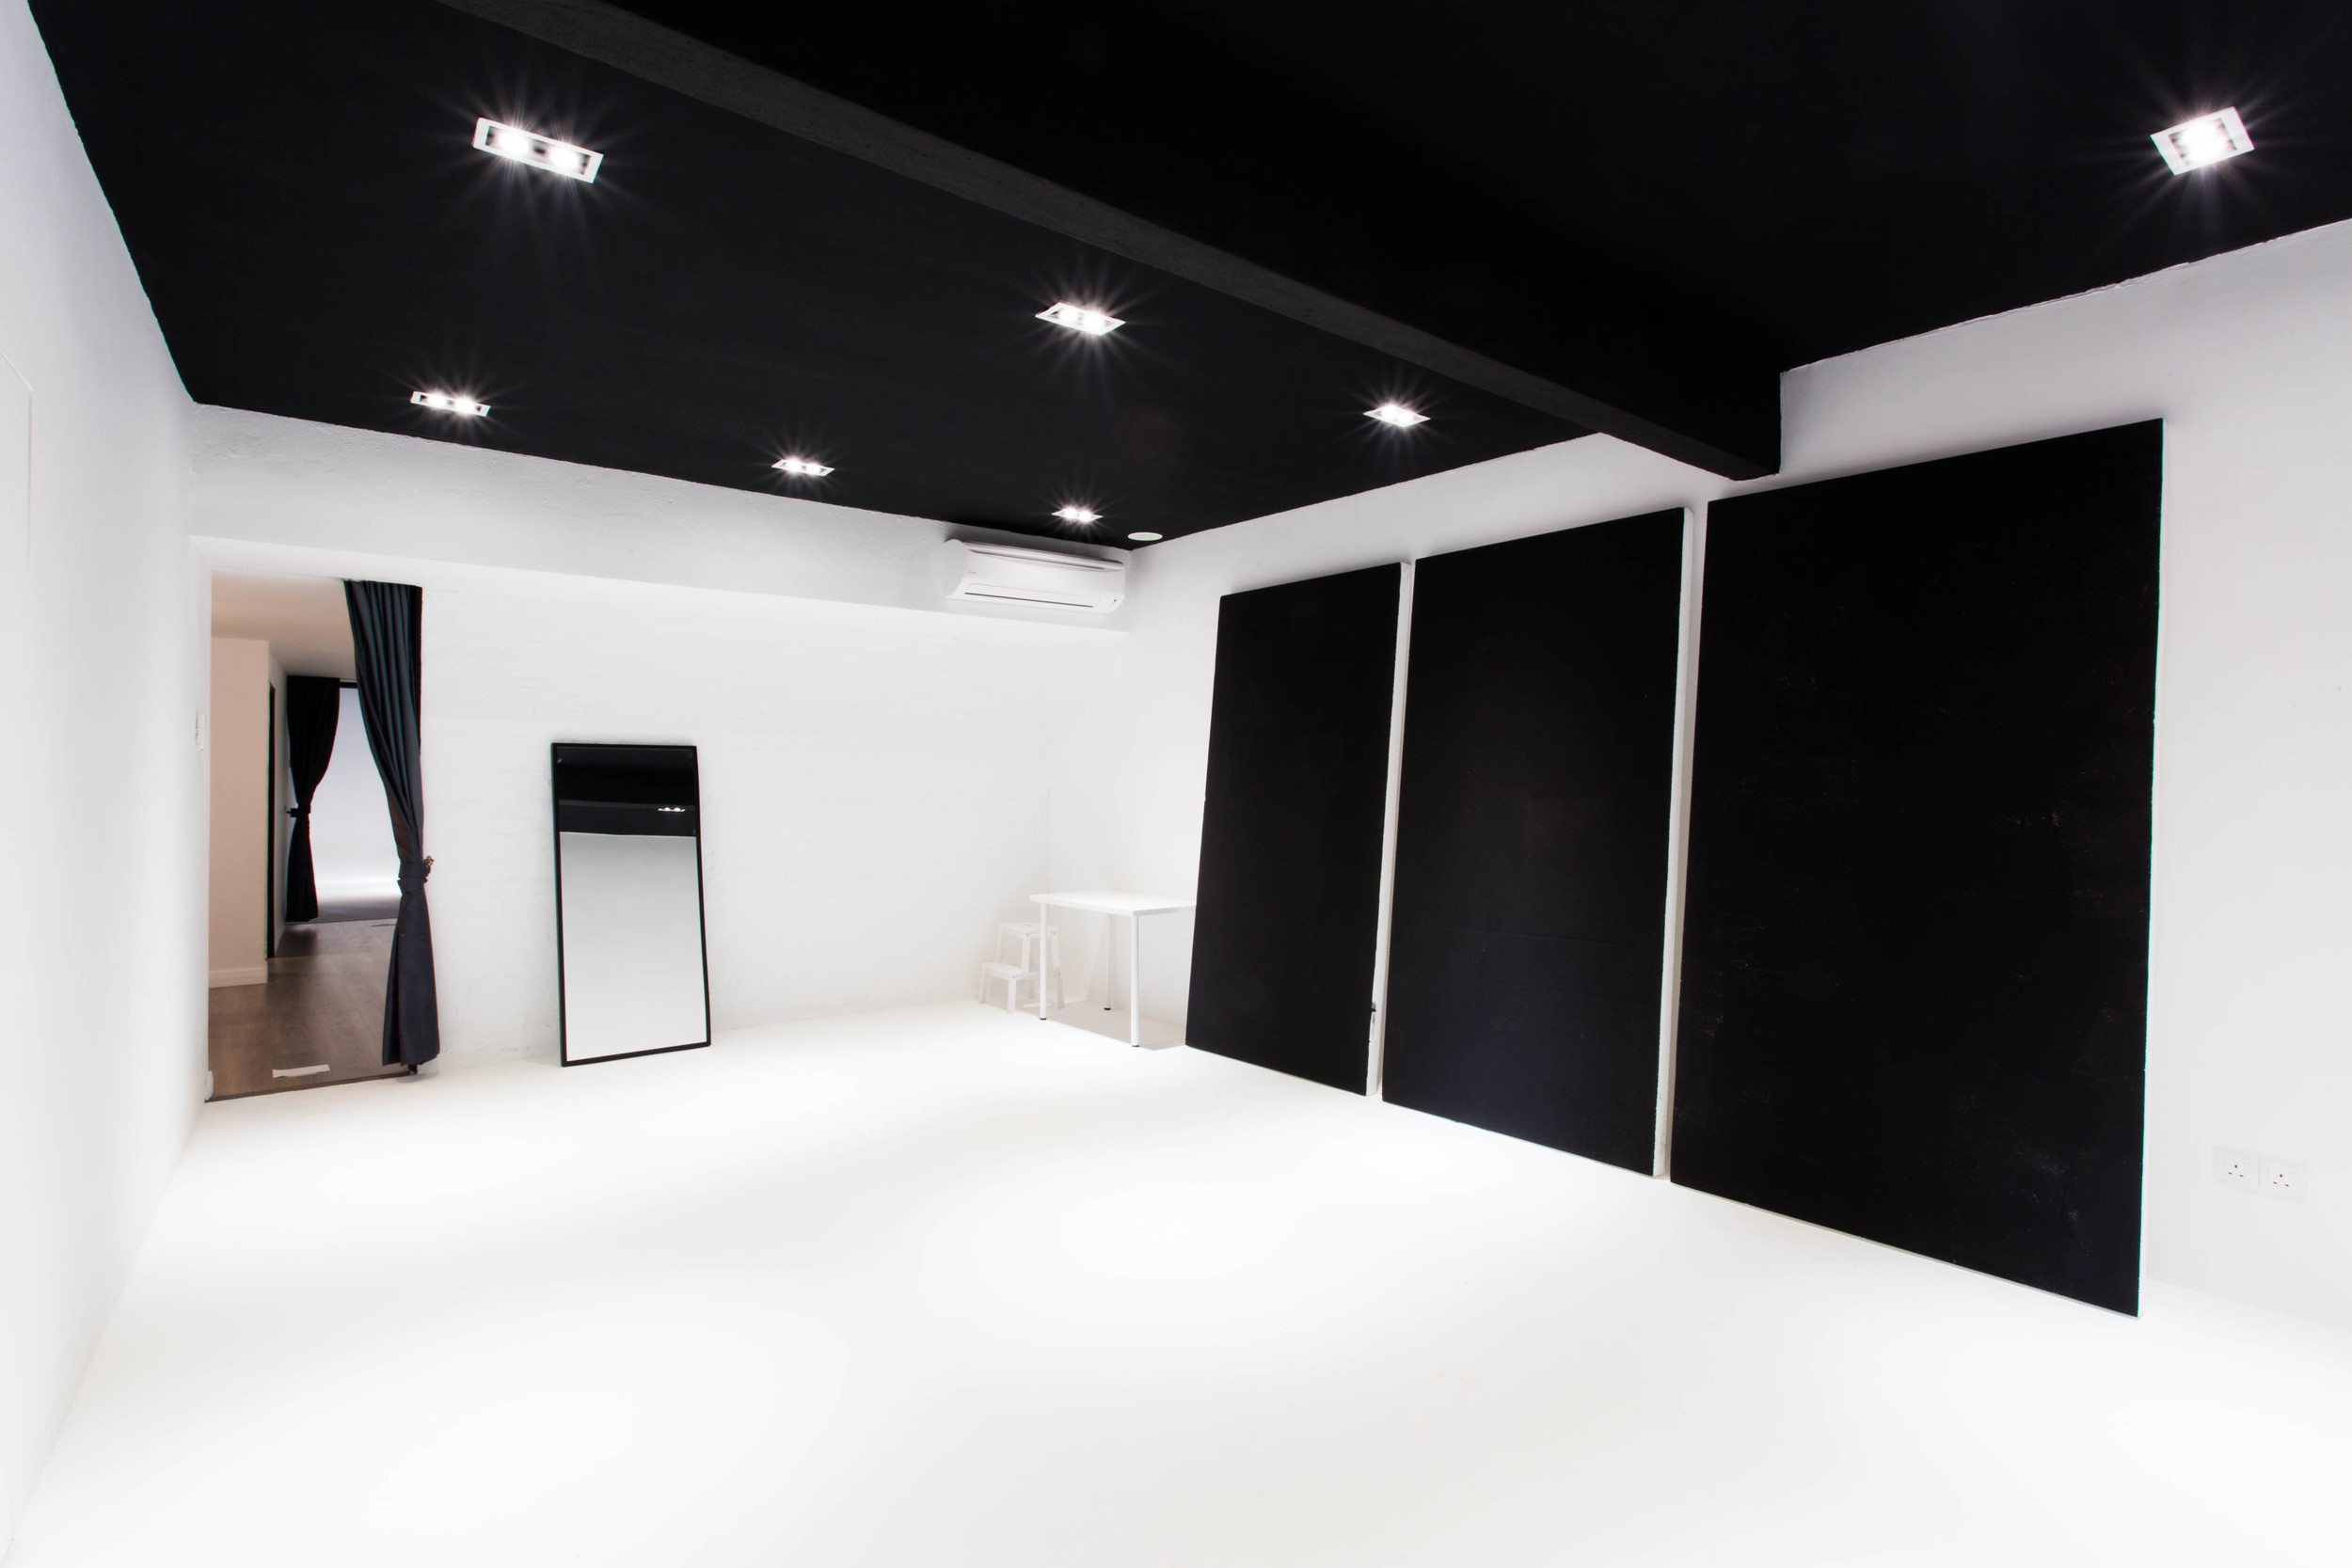 Studio_interior-2.jpg